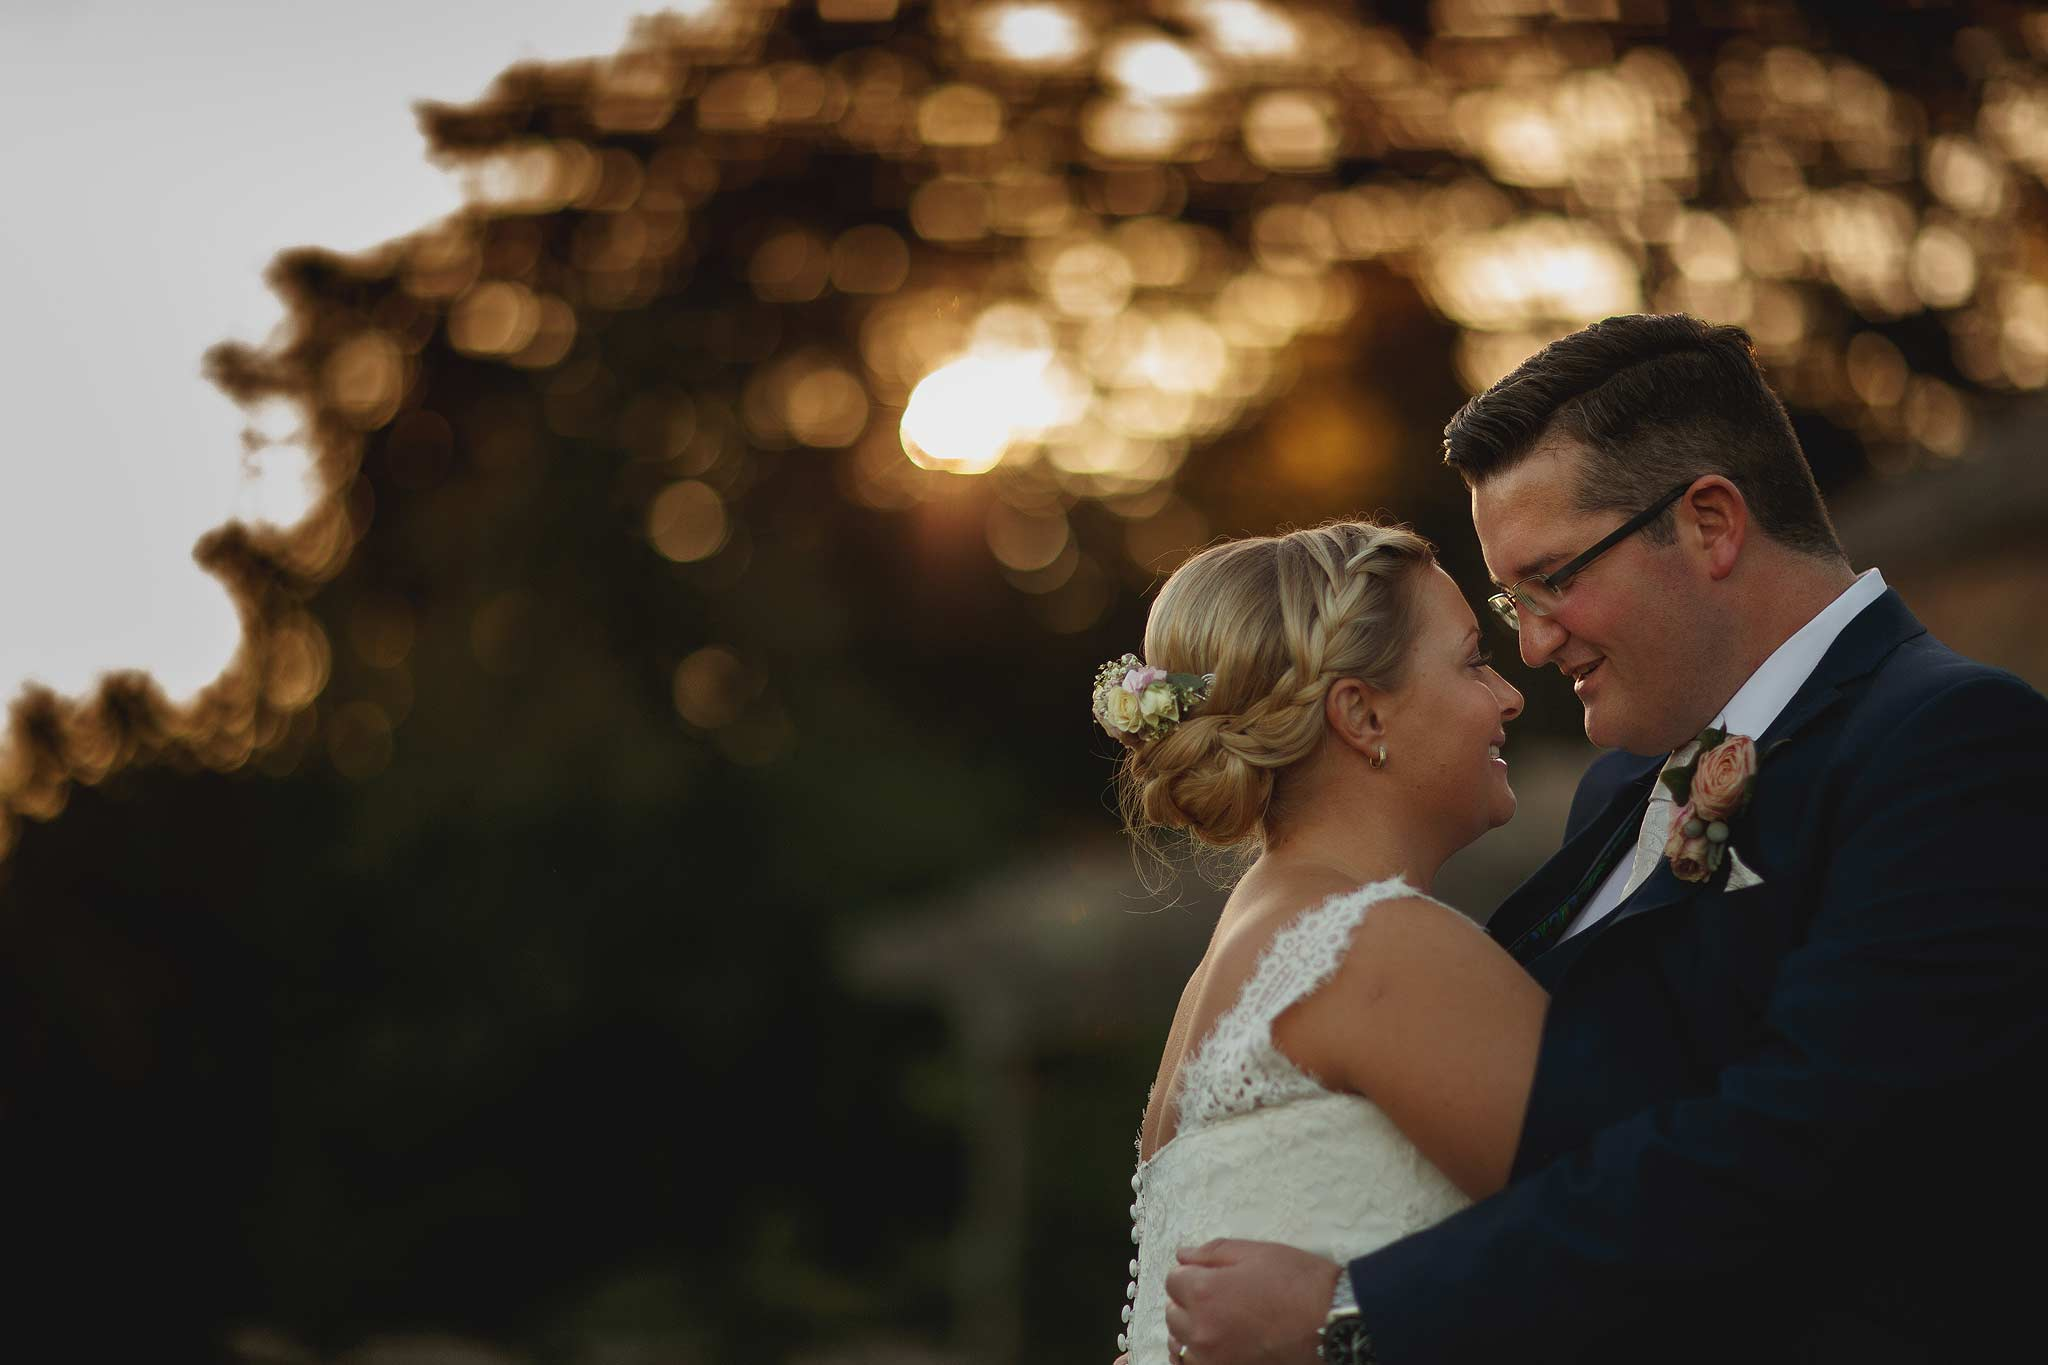 nice bokeh behind bride and groom at sunset